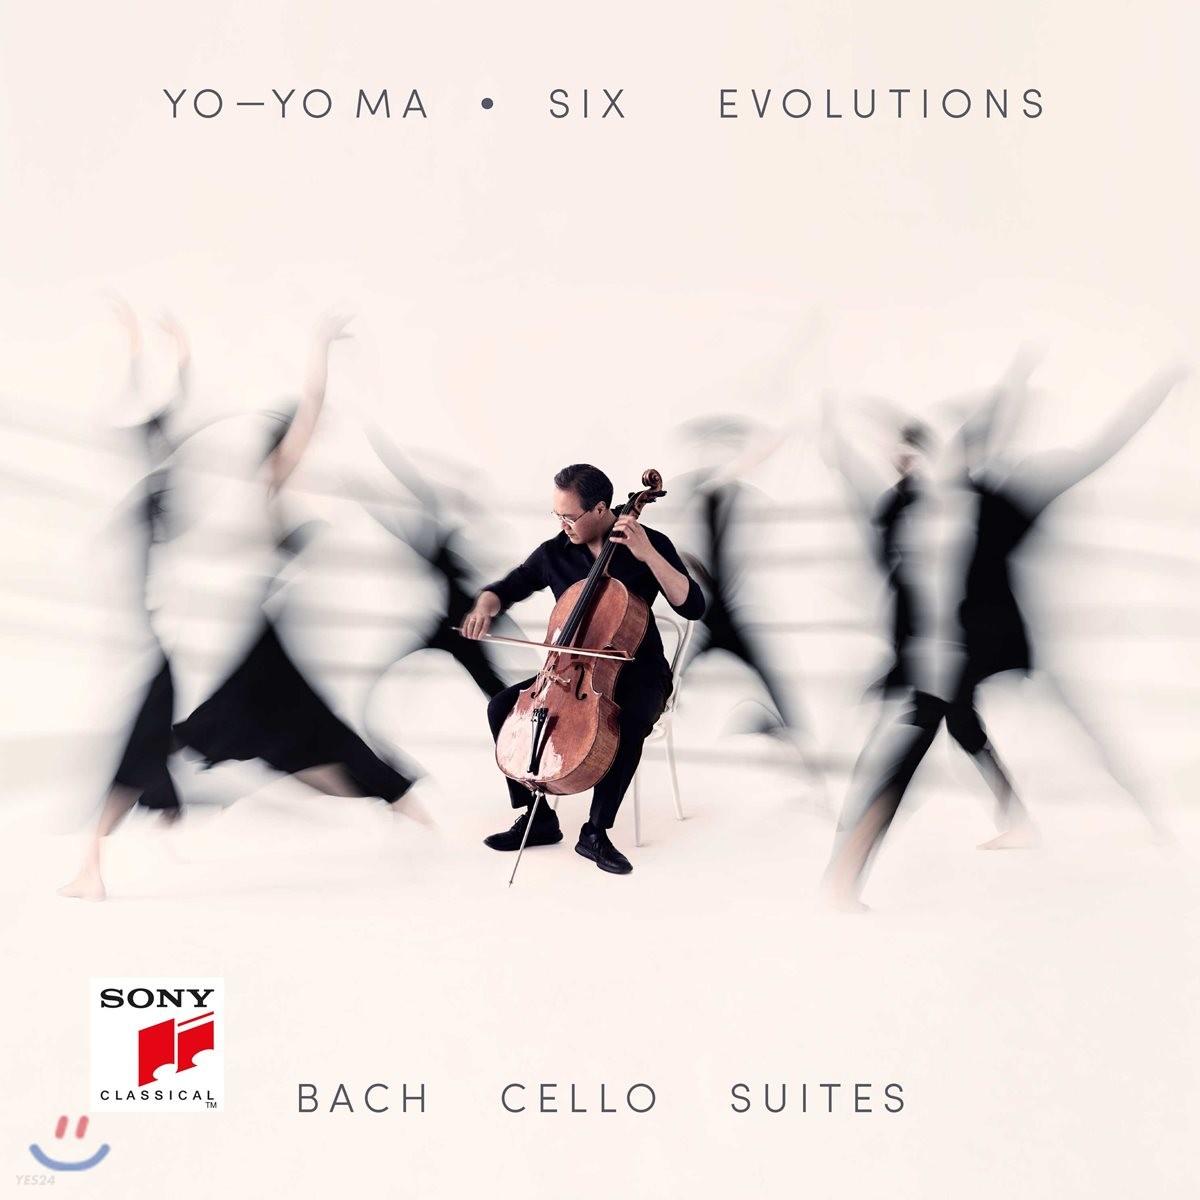 Yo-Yo Ma 바흐: 무반주 첼로 모음곡 전곡집 (Six Evolutions - Bach: Cello Suites) 요요 마